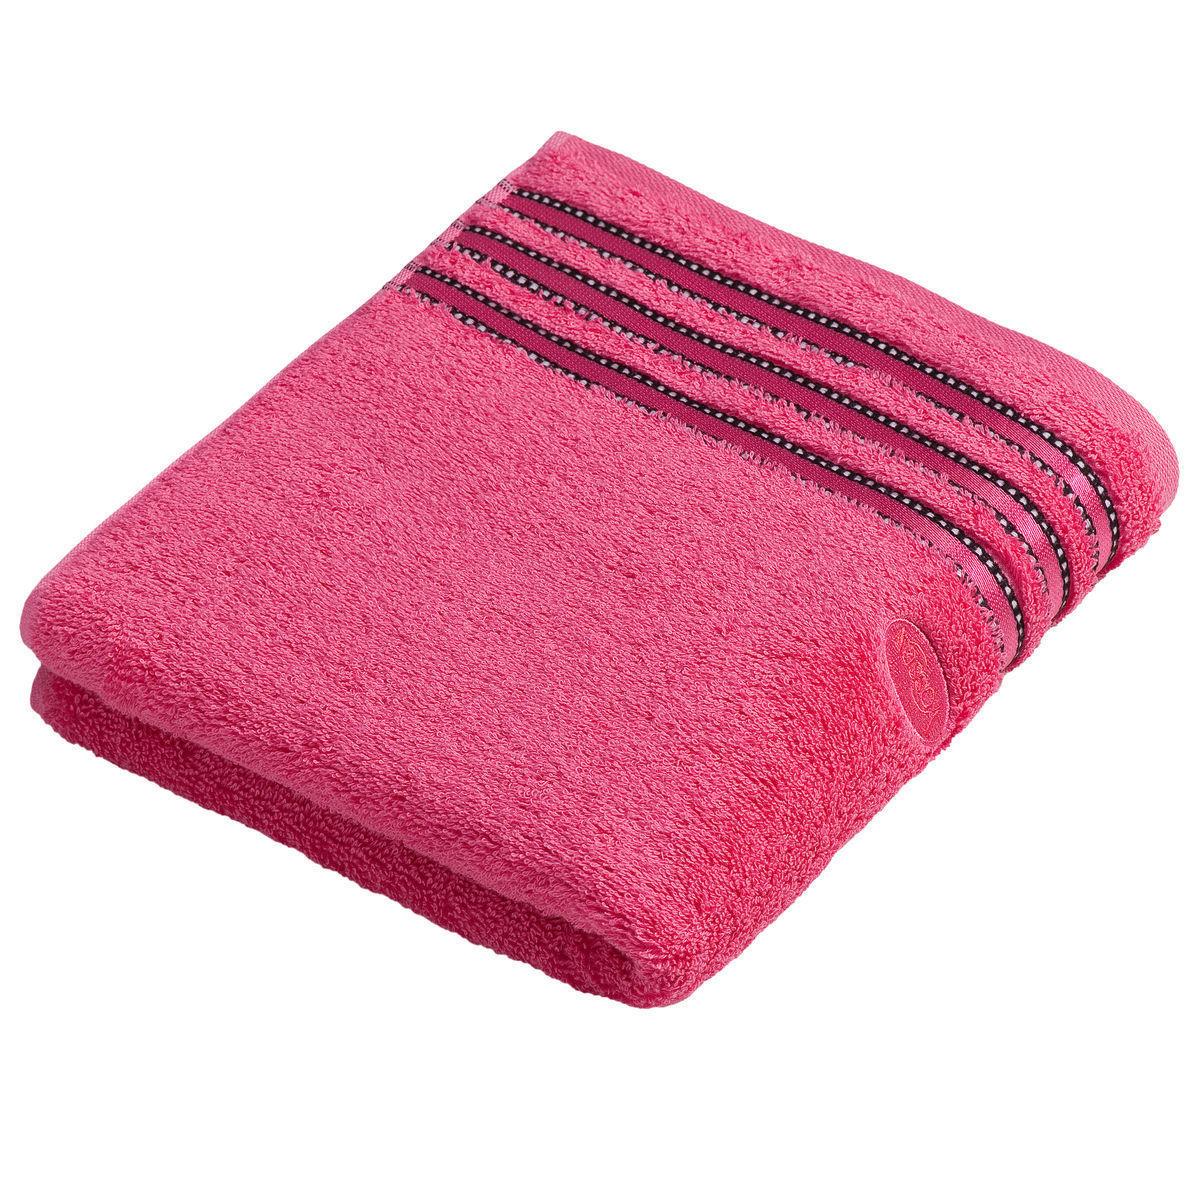 Полотенца Полотенце 67x140 Vossen Cult de Luxe rosy pink elitnoe-polotentse-cult-de-luxe-rosy-pink-ot-vossen-avstriya-50x100-1.jpg